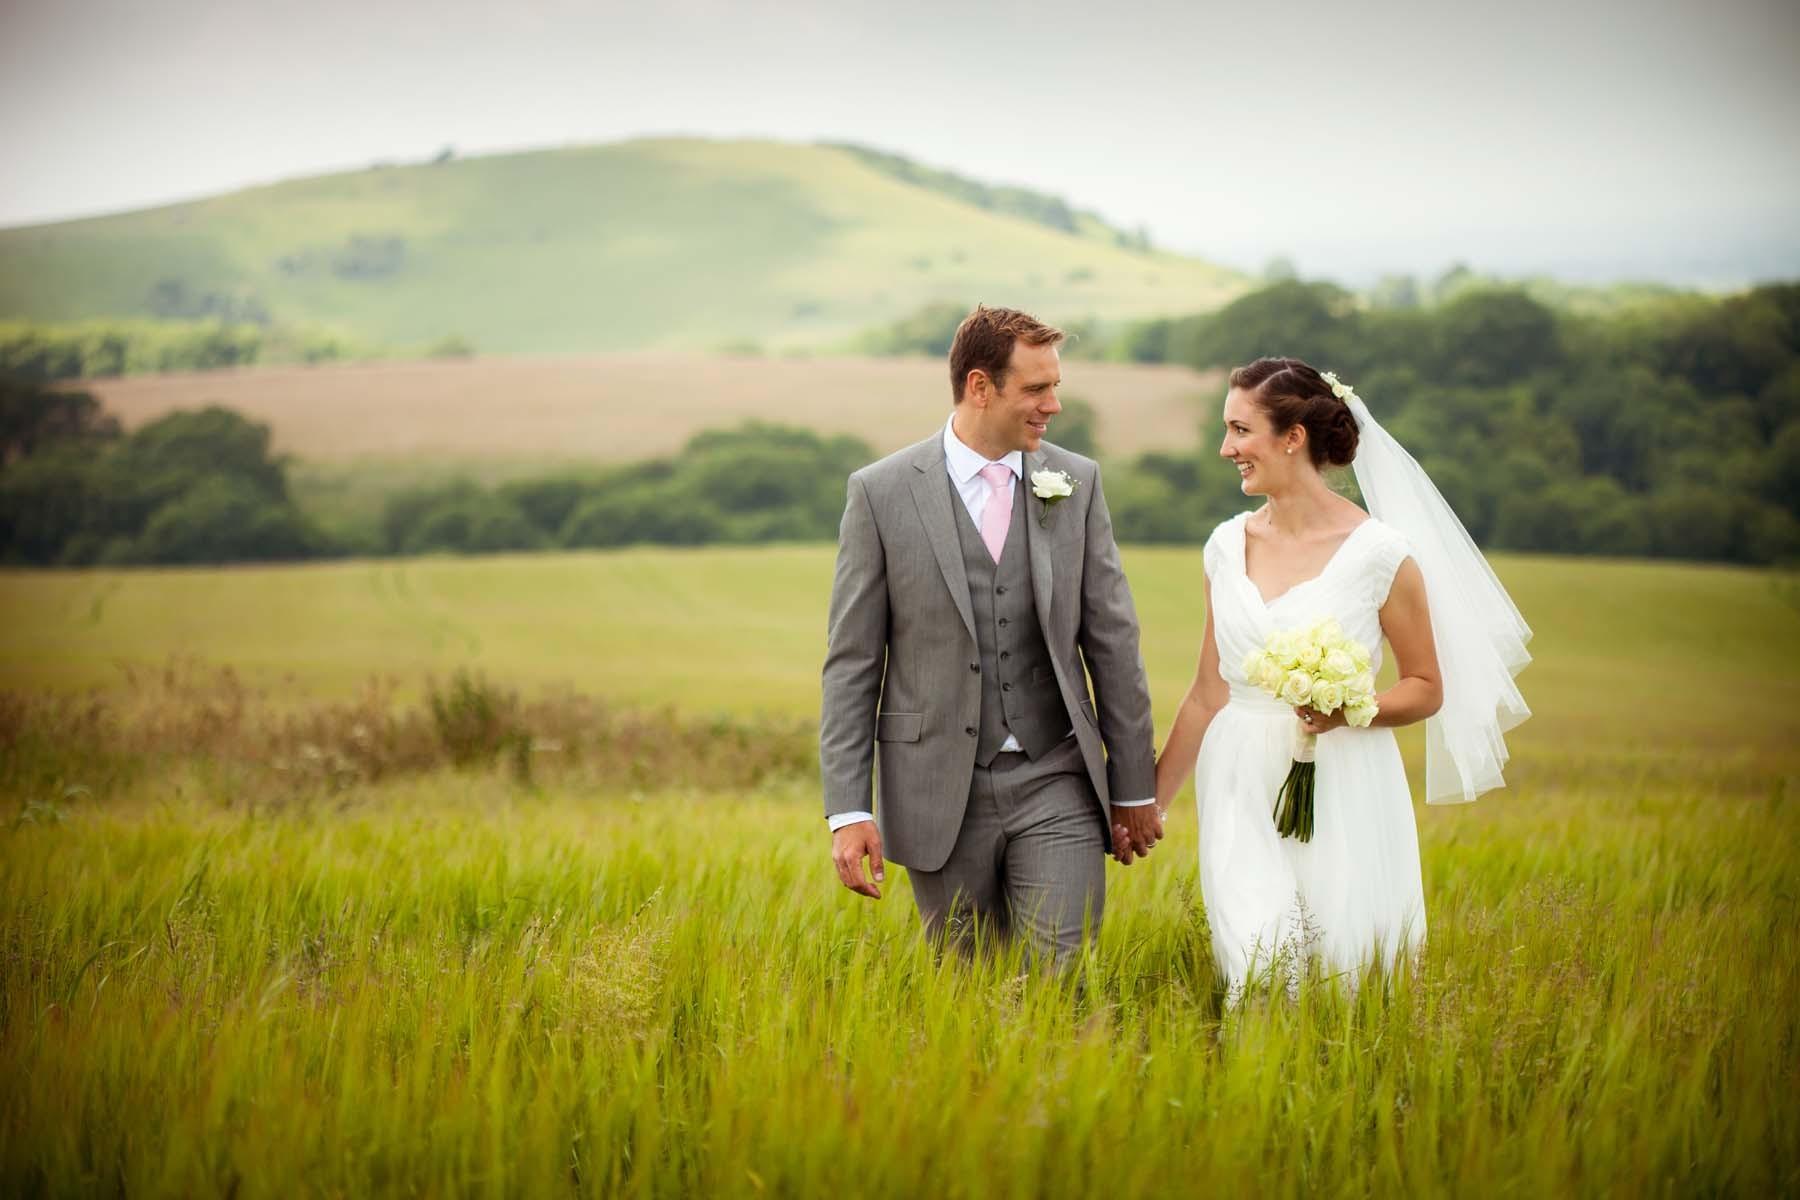 Sussex & Surrey Wedding Photographer - Bride & Groom (1)